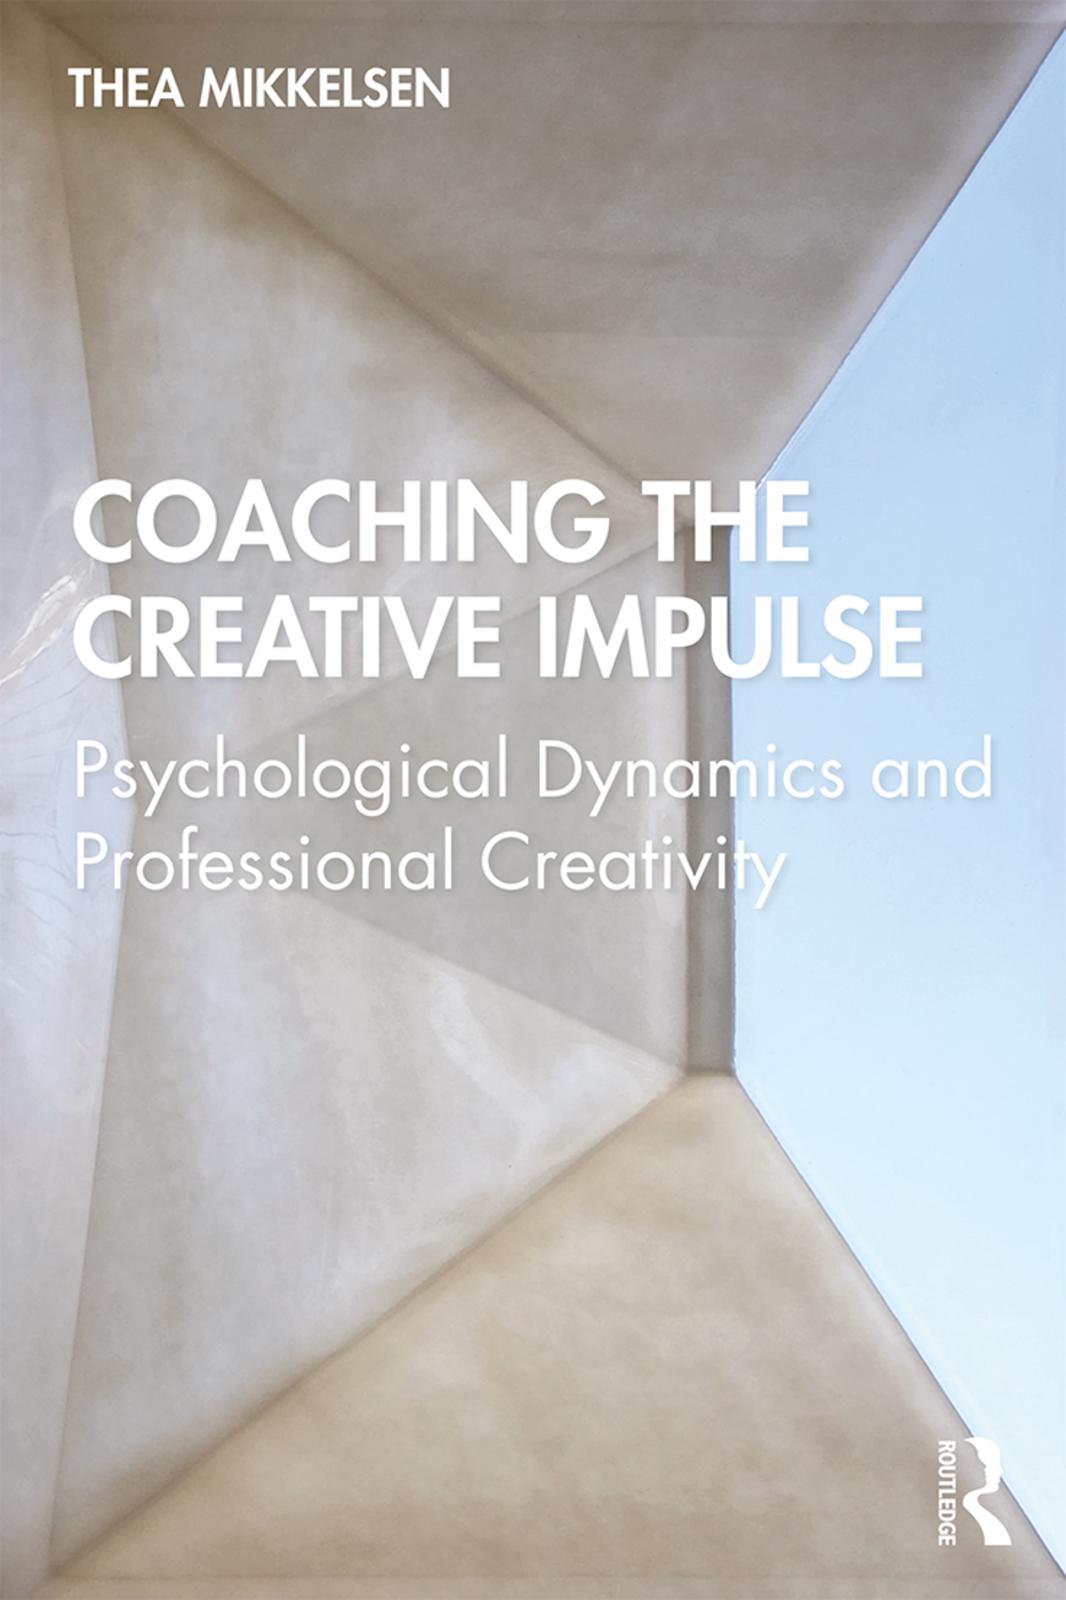 Creativity and the self